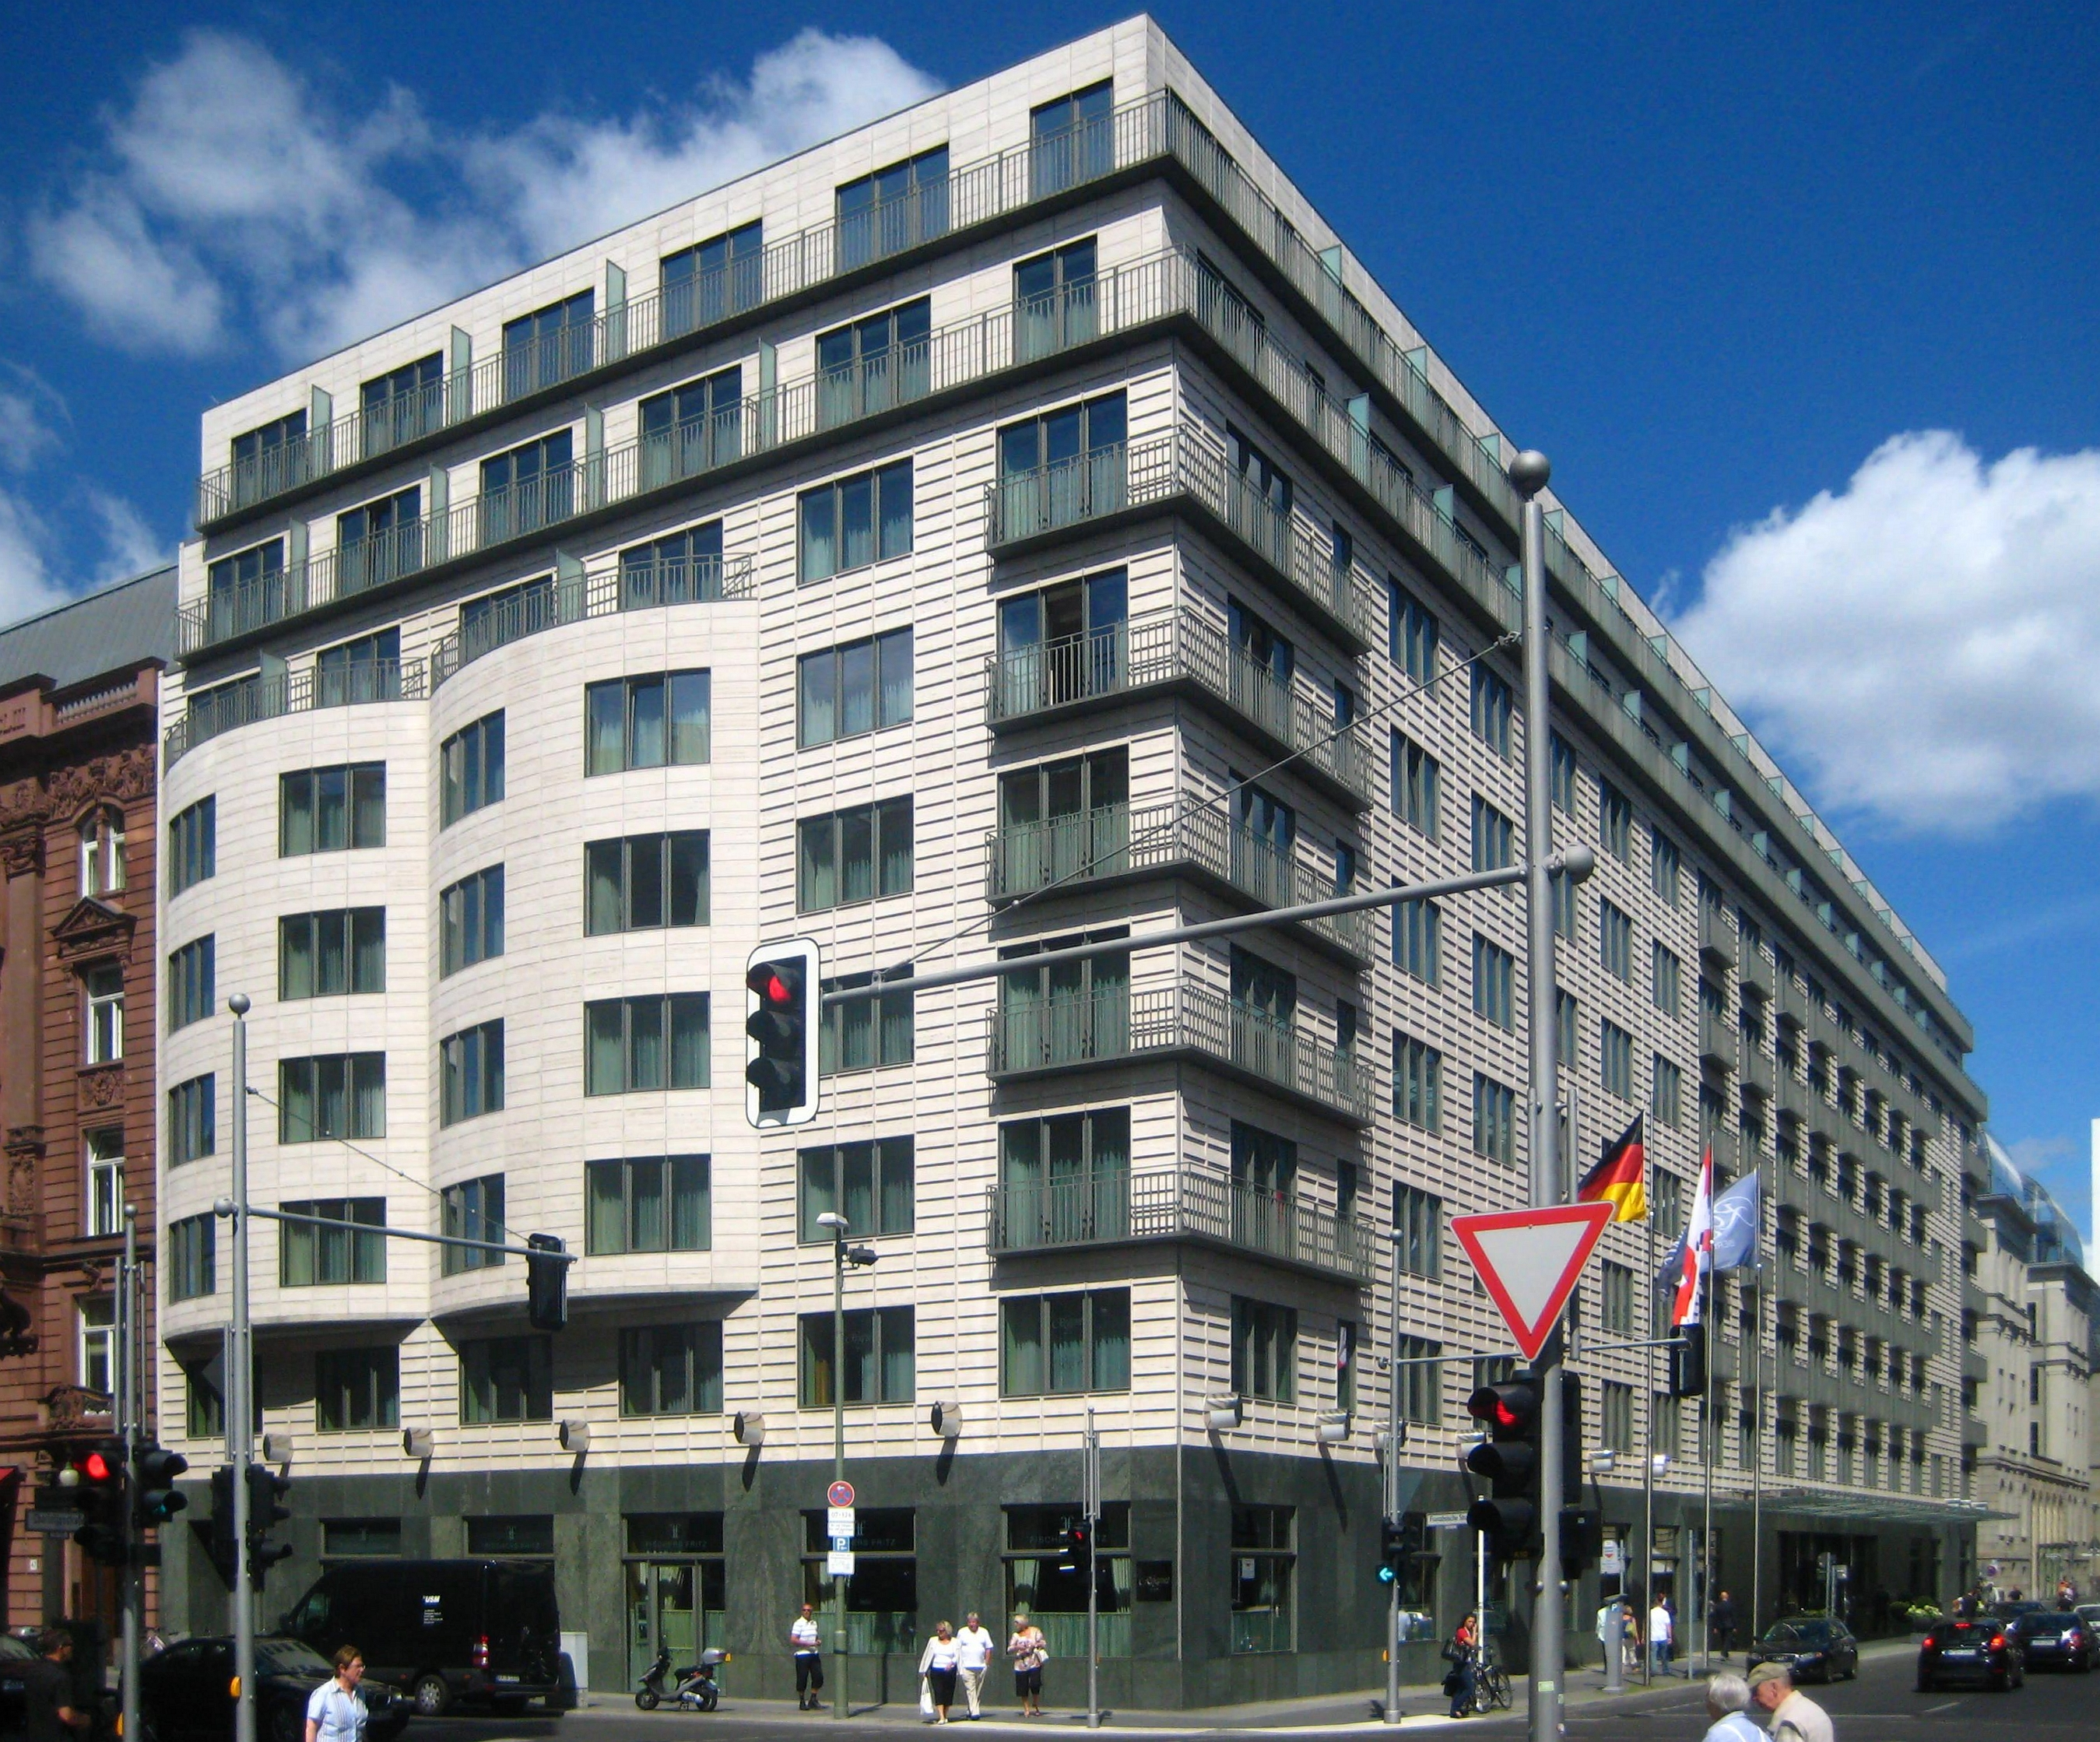 Hotels Berlin In Der Nahe Gneisenaustra Ef Bf Bde